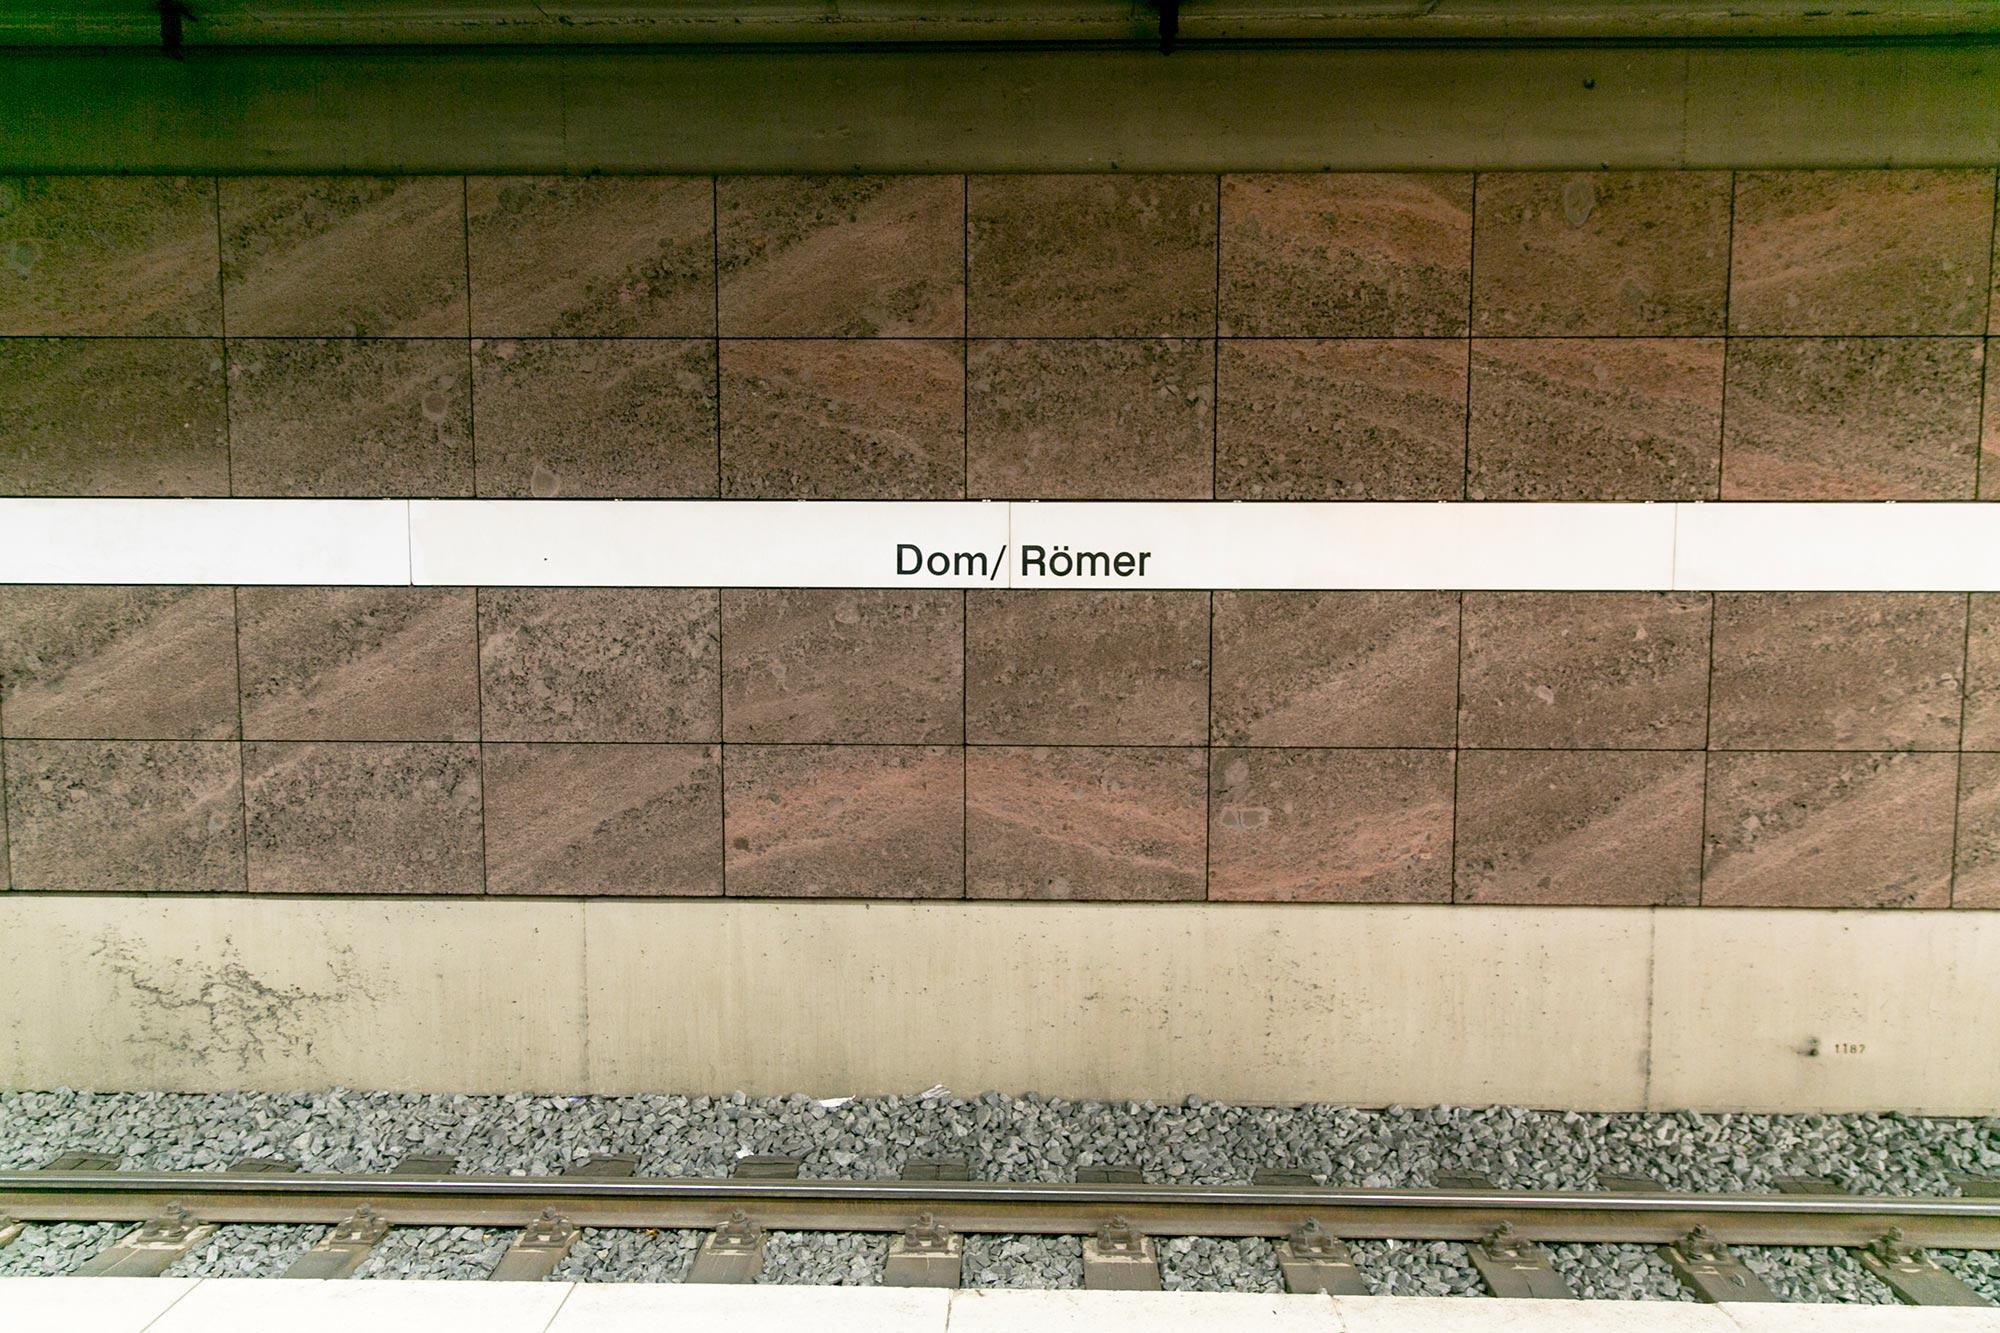 dom romer subway frankfurt